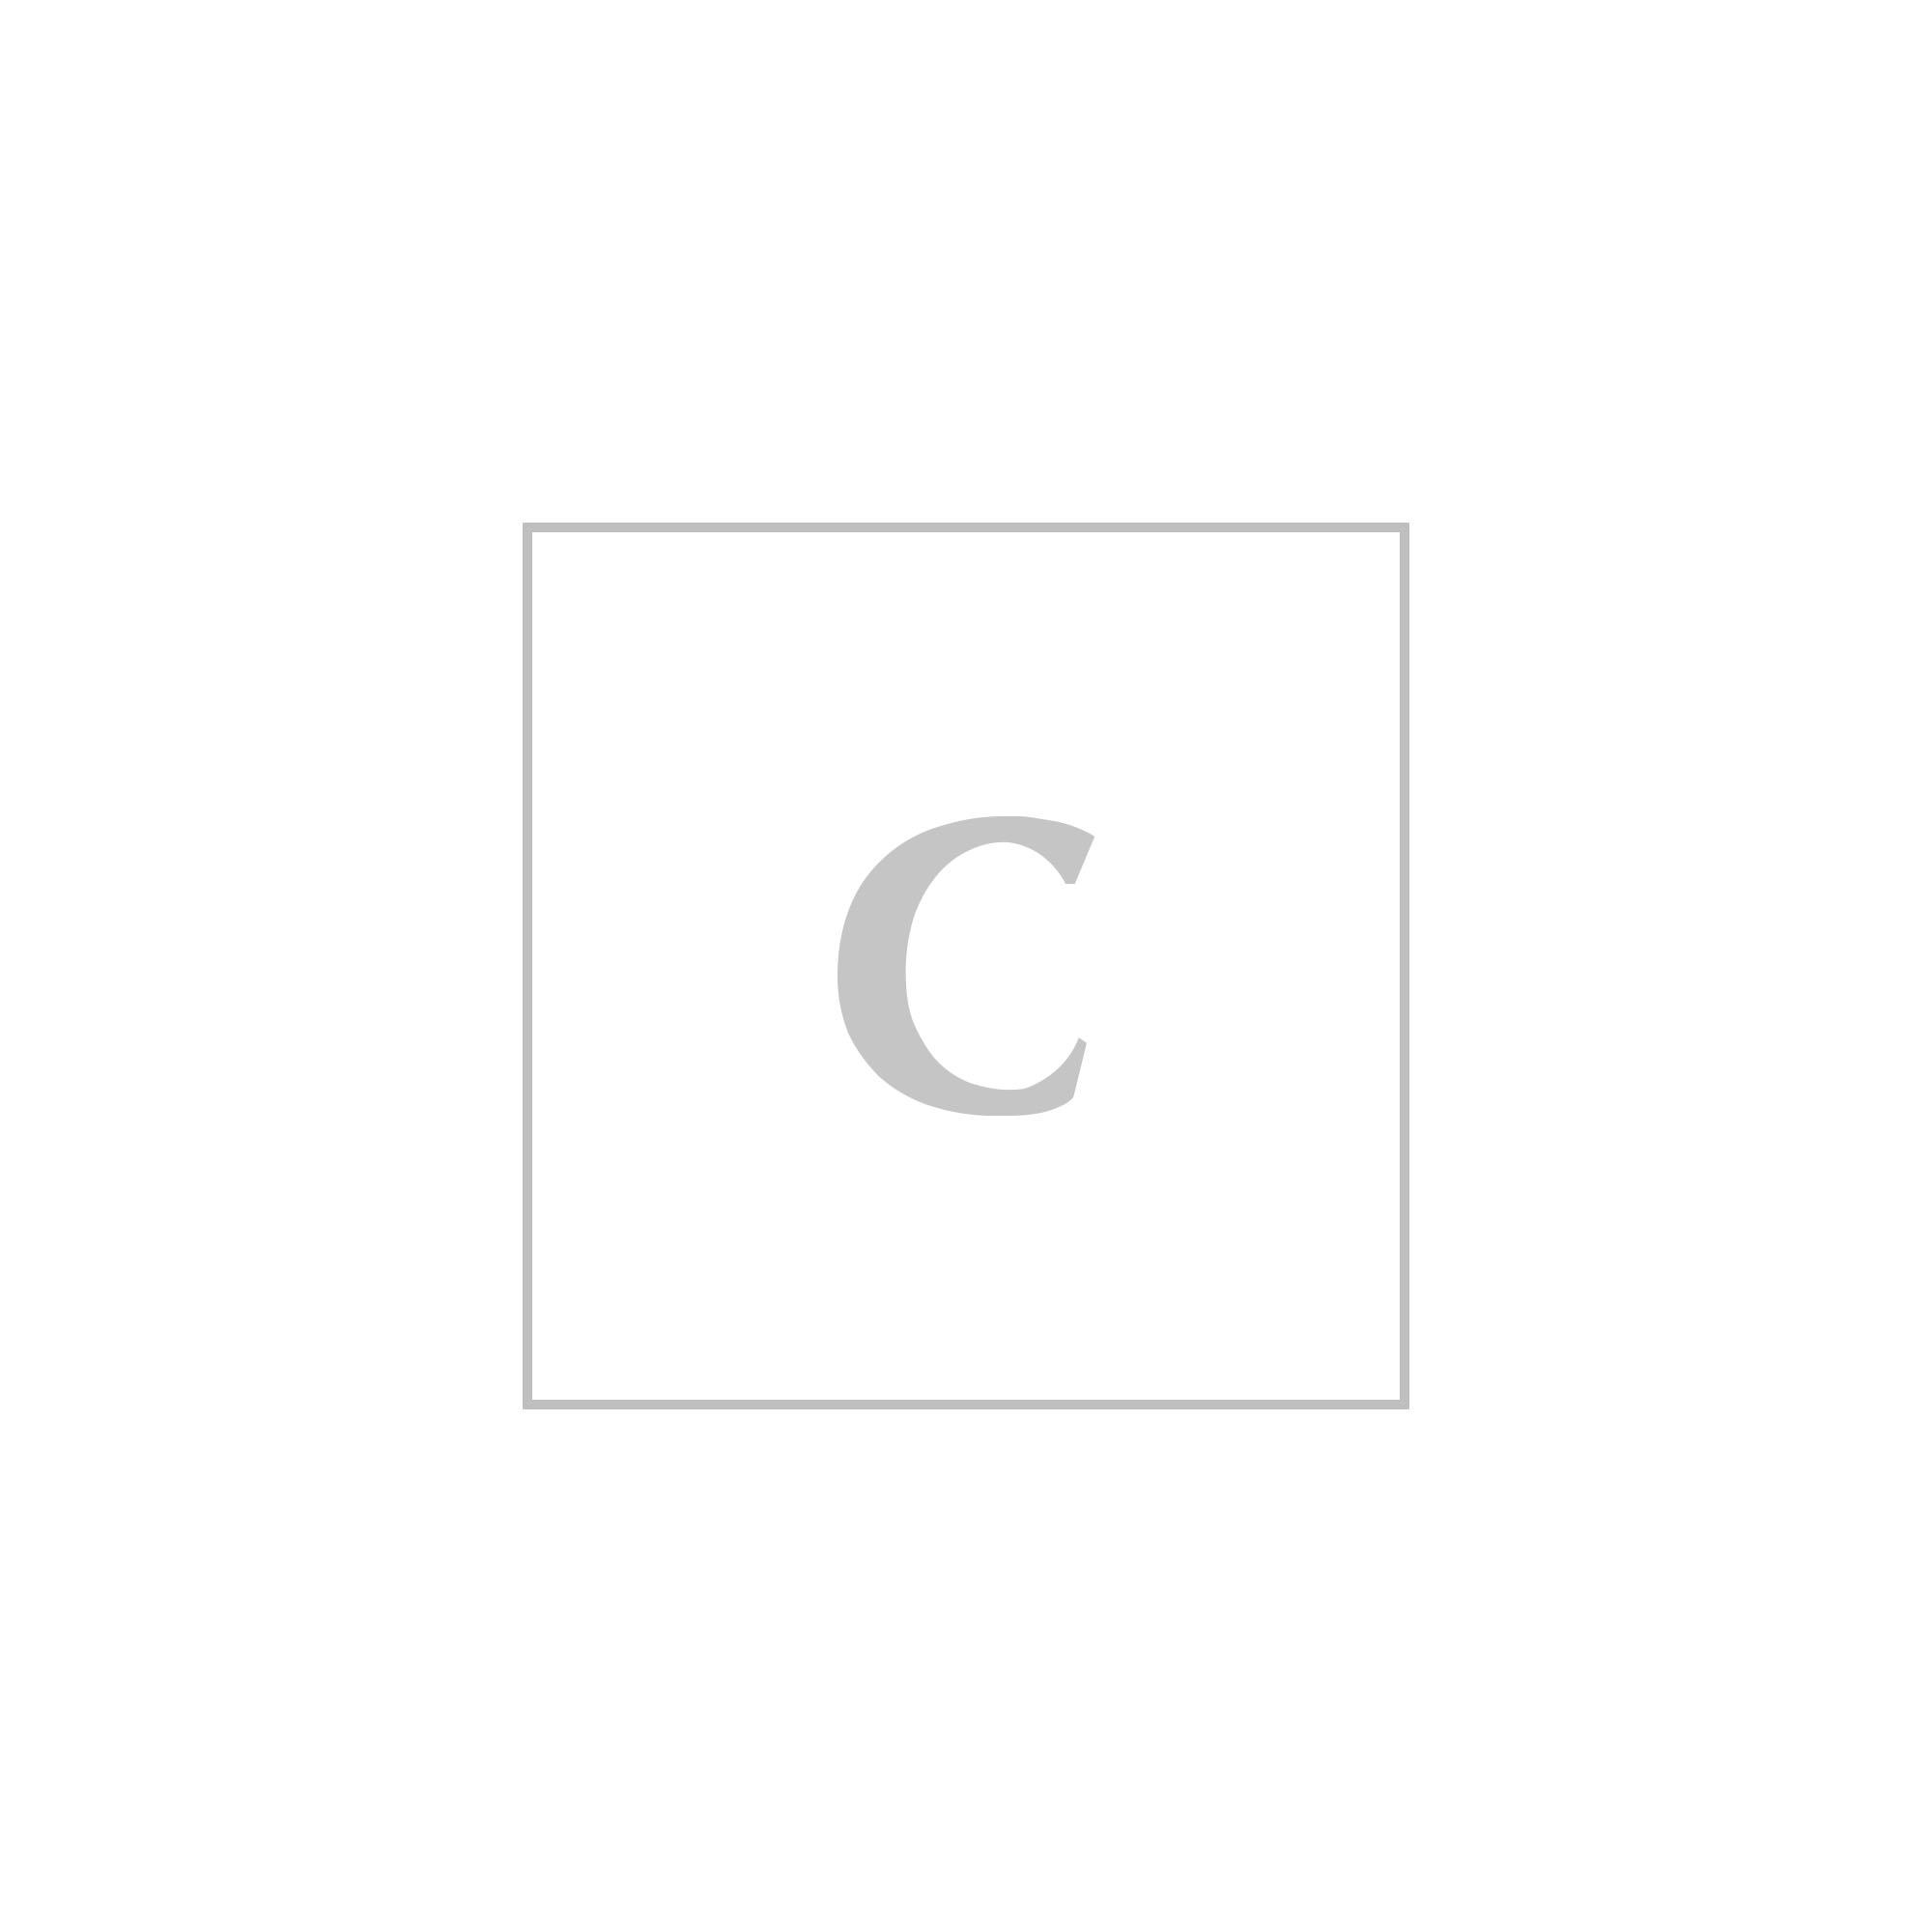 Customer account login index php admin cms_wysiwyg directive/admin/Cms_Wysiwyg/directive - Dsquared2 T Shirt